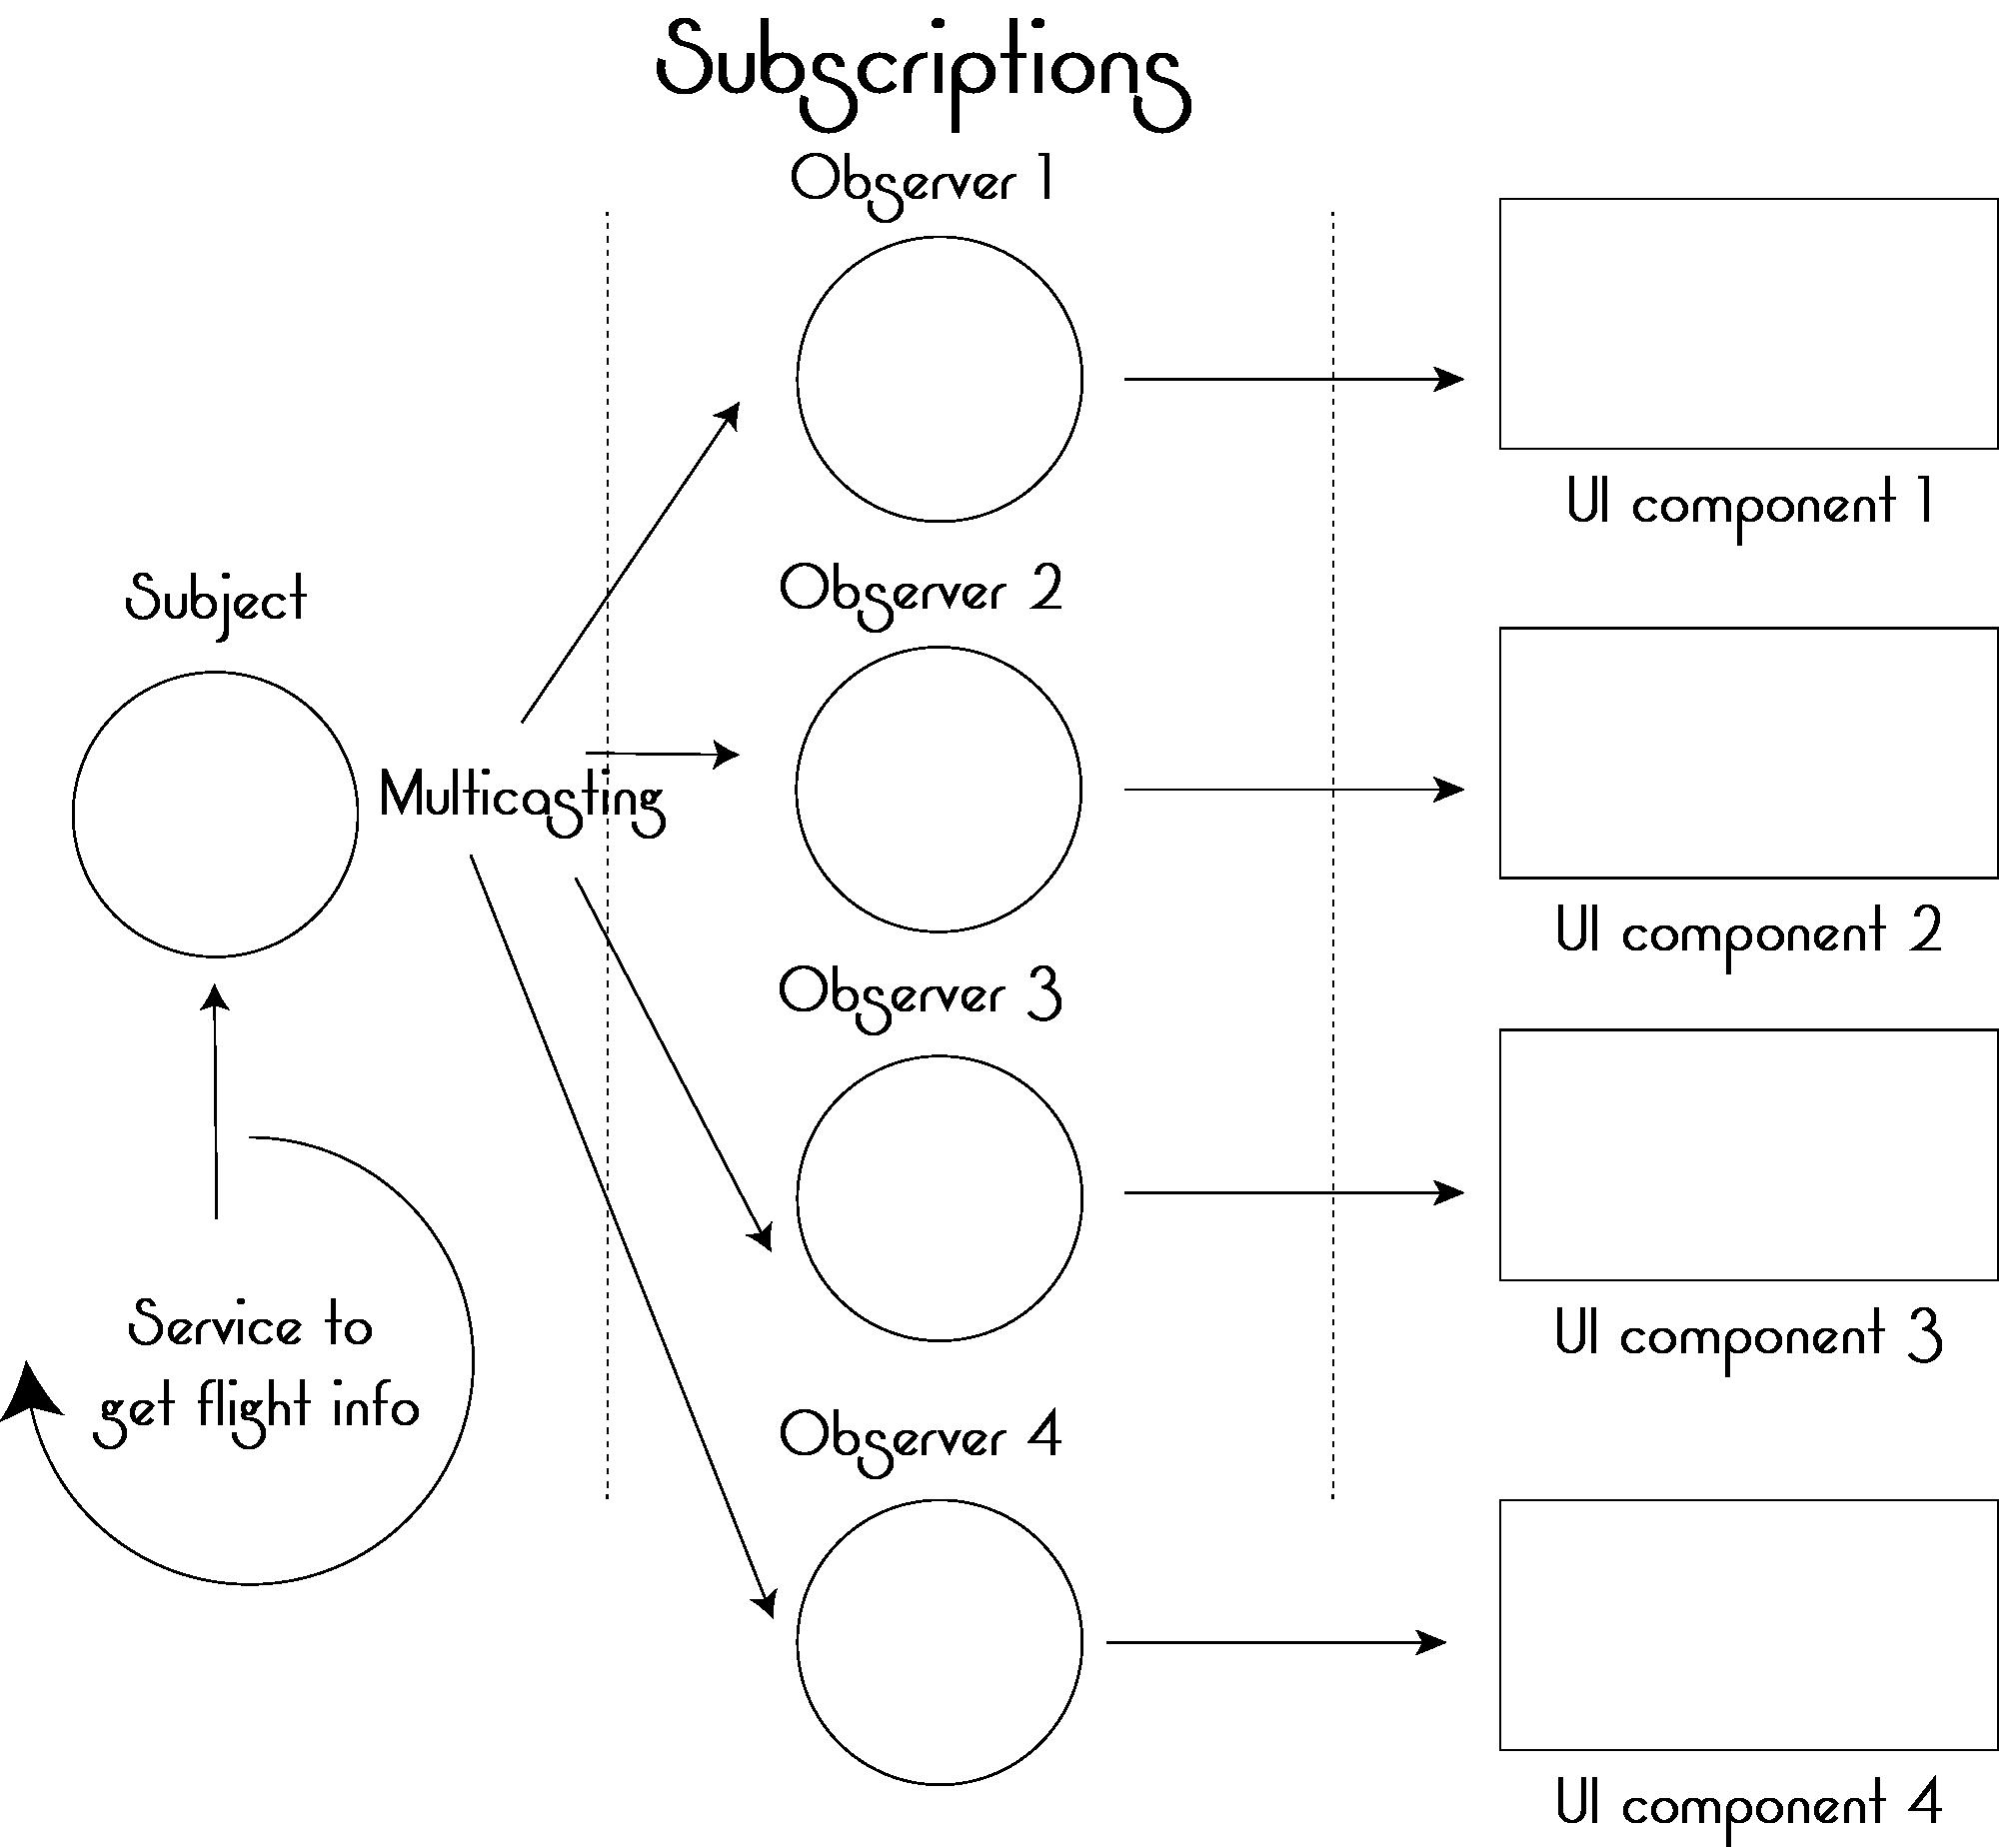 SuperFast Angular UX using Rx js observables